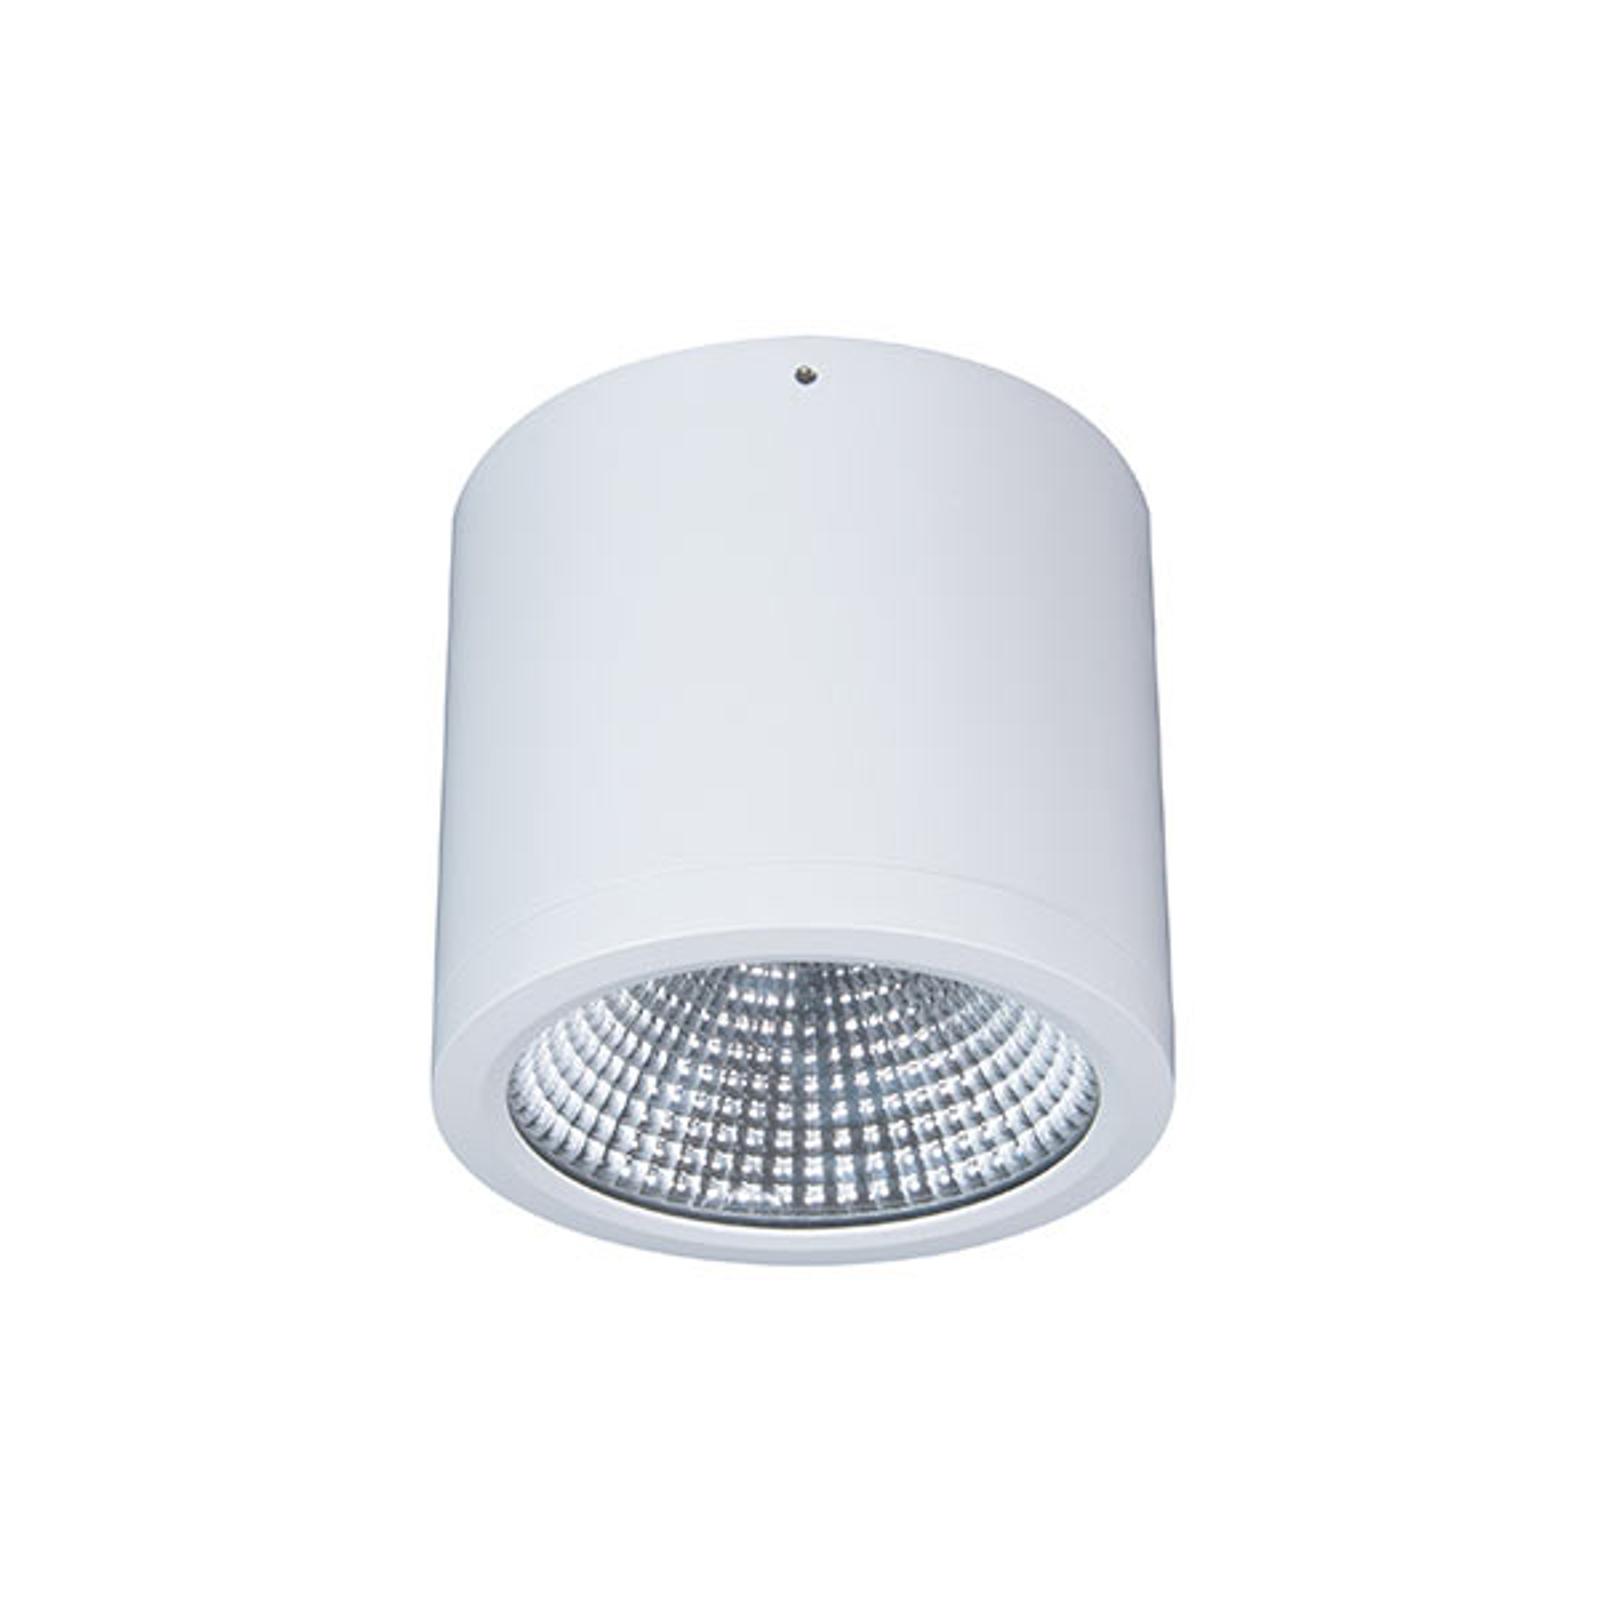 LED-Anbau-Downlight Button Mini 200 IP54 55° 24 W